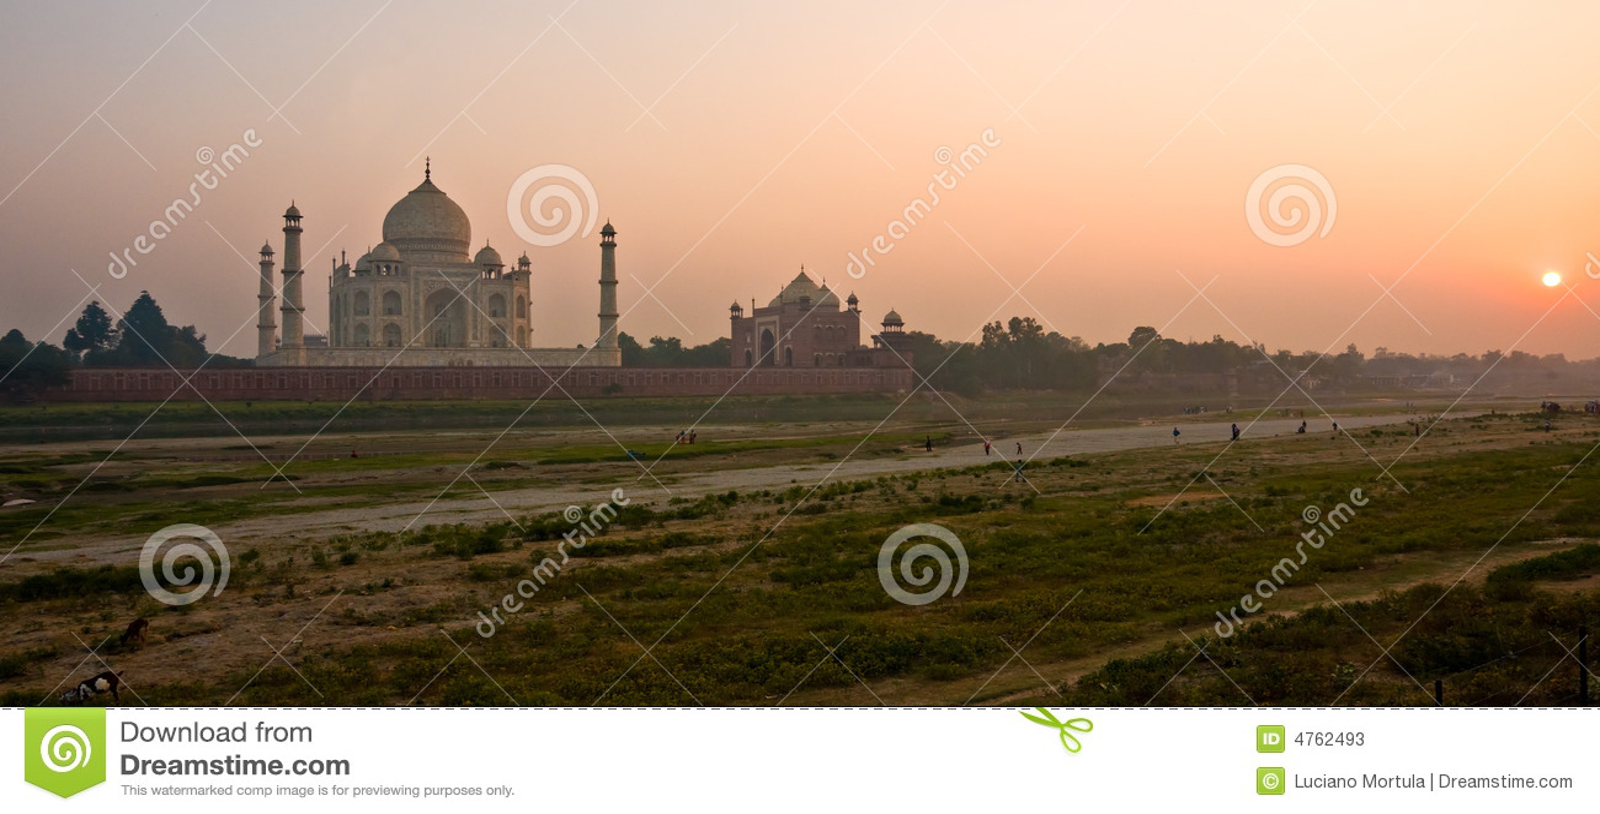 Taj Mahal au coucher du soleil, Agra, uttar pradesh, Inde.